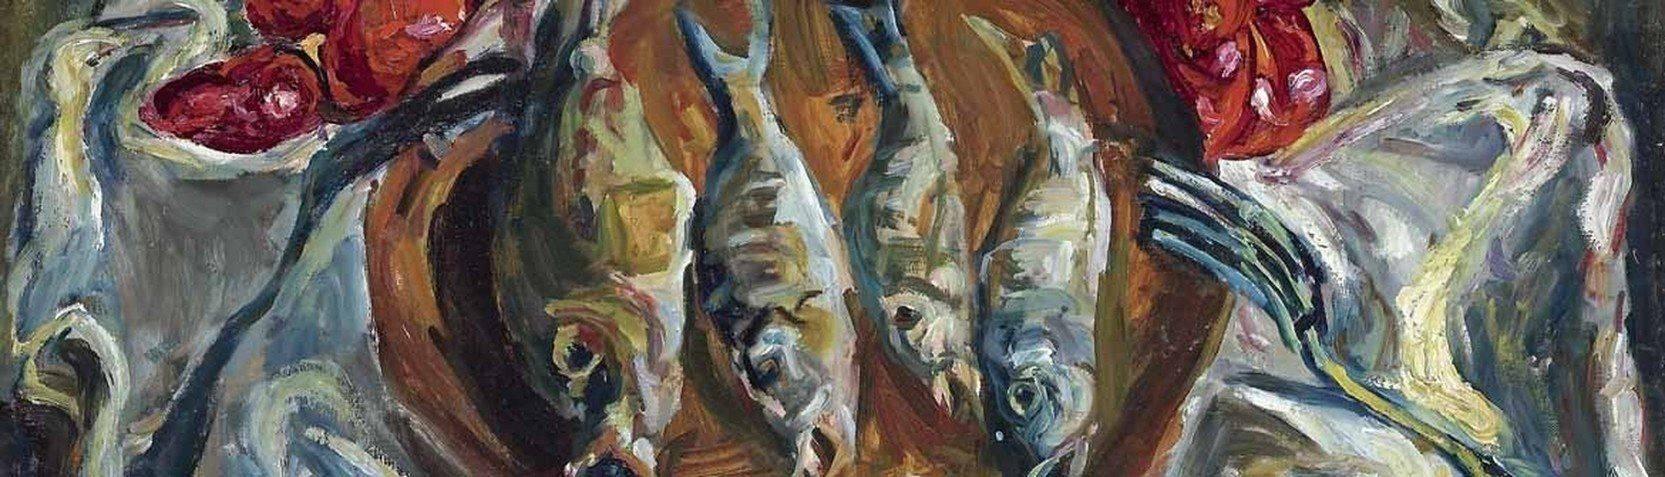 Artistas - Chaim Soutine